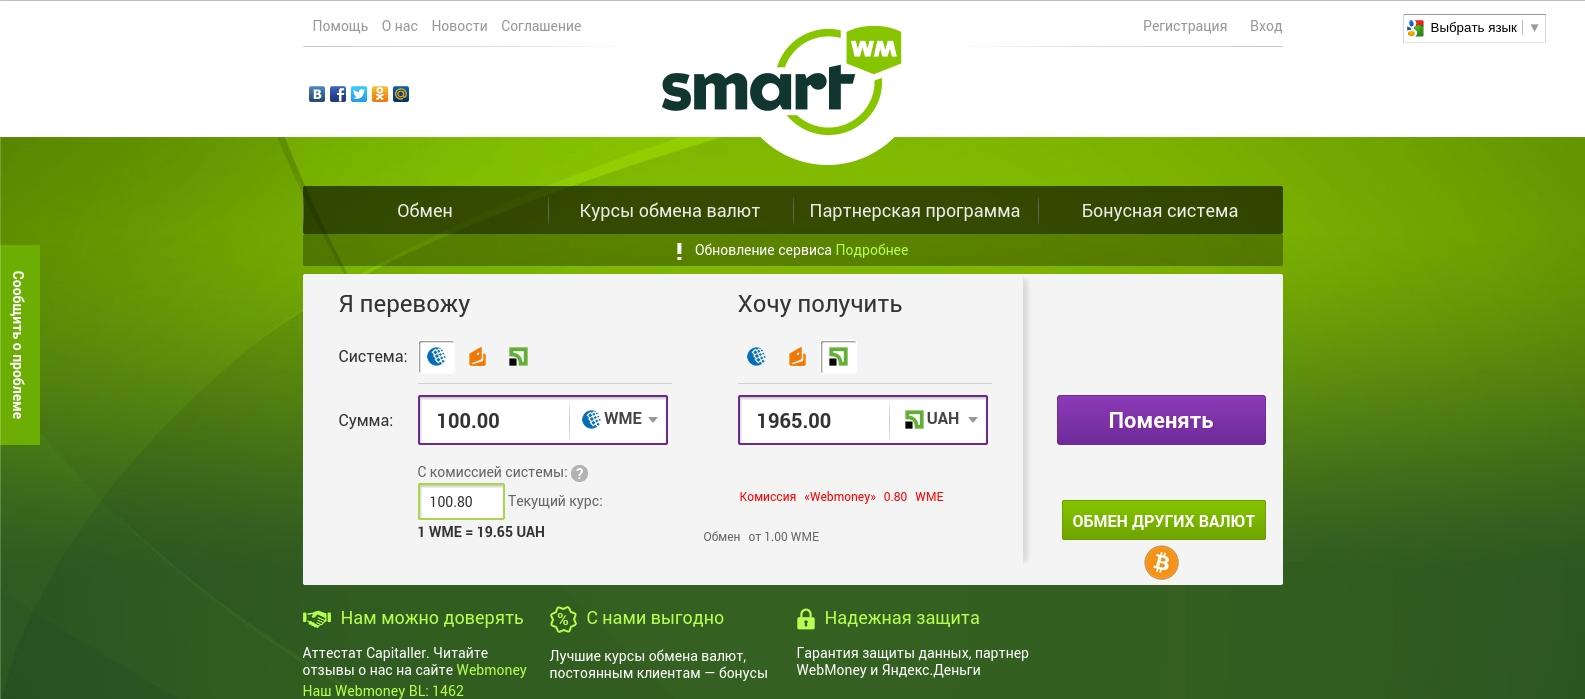 киви на приват24 smartwm.ru